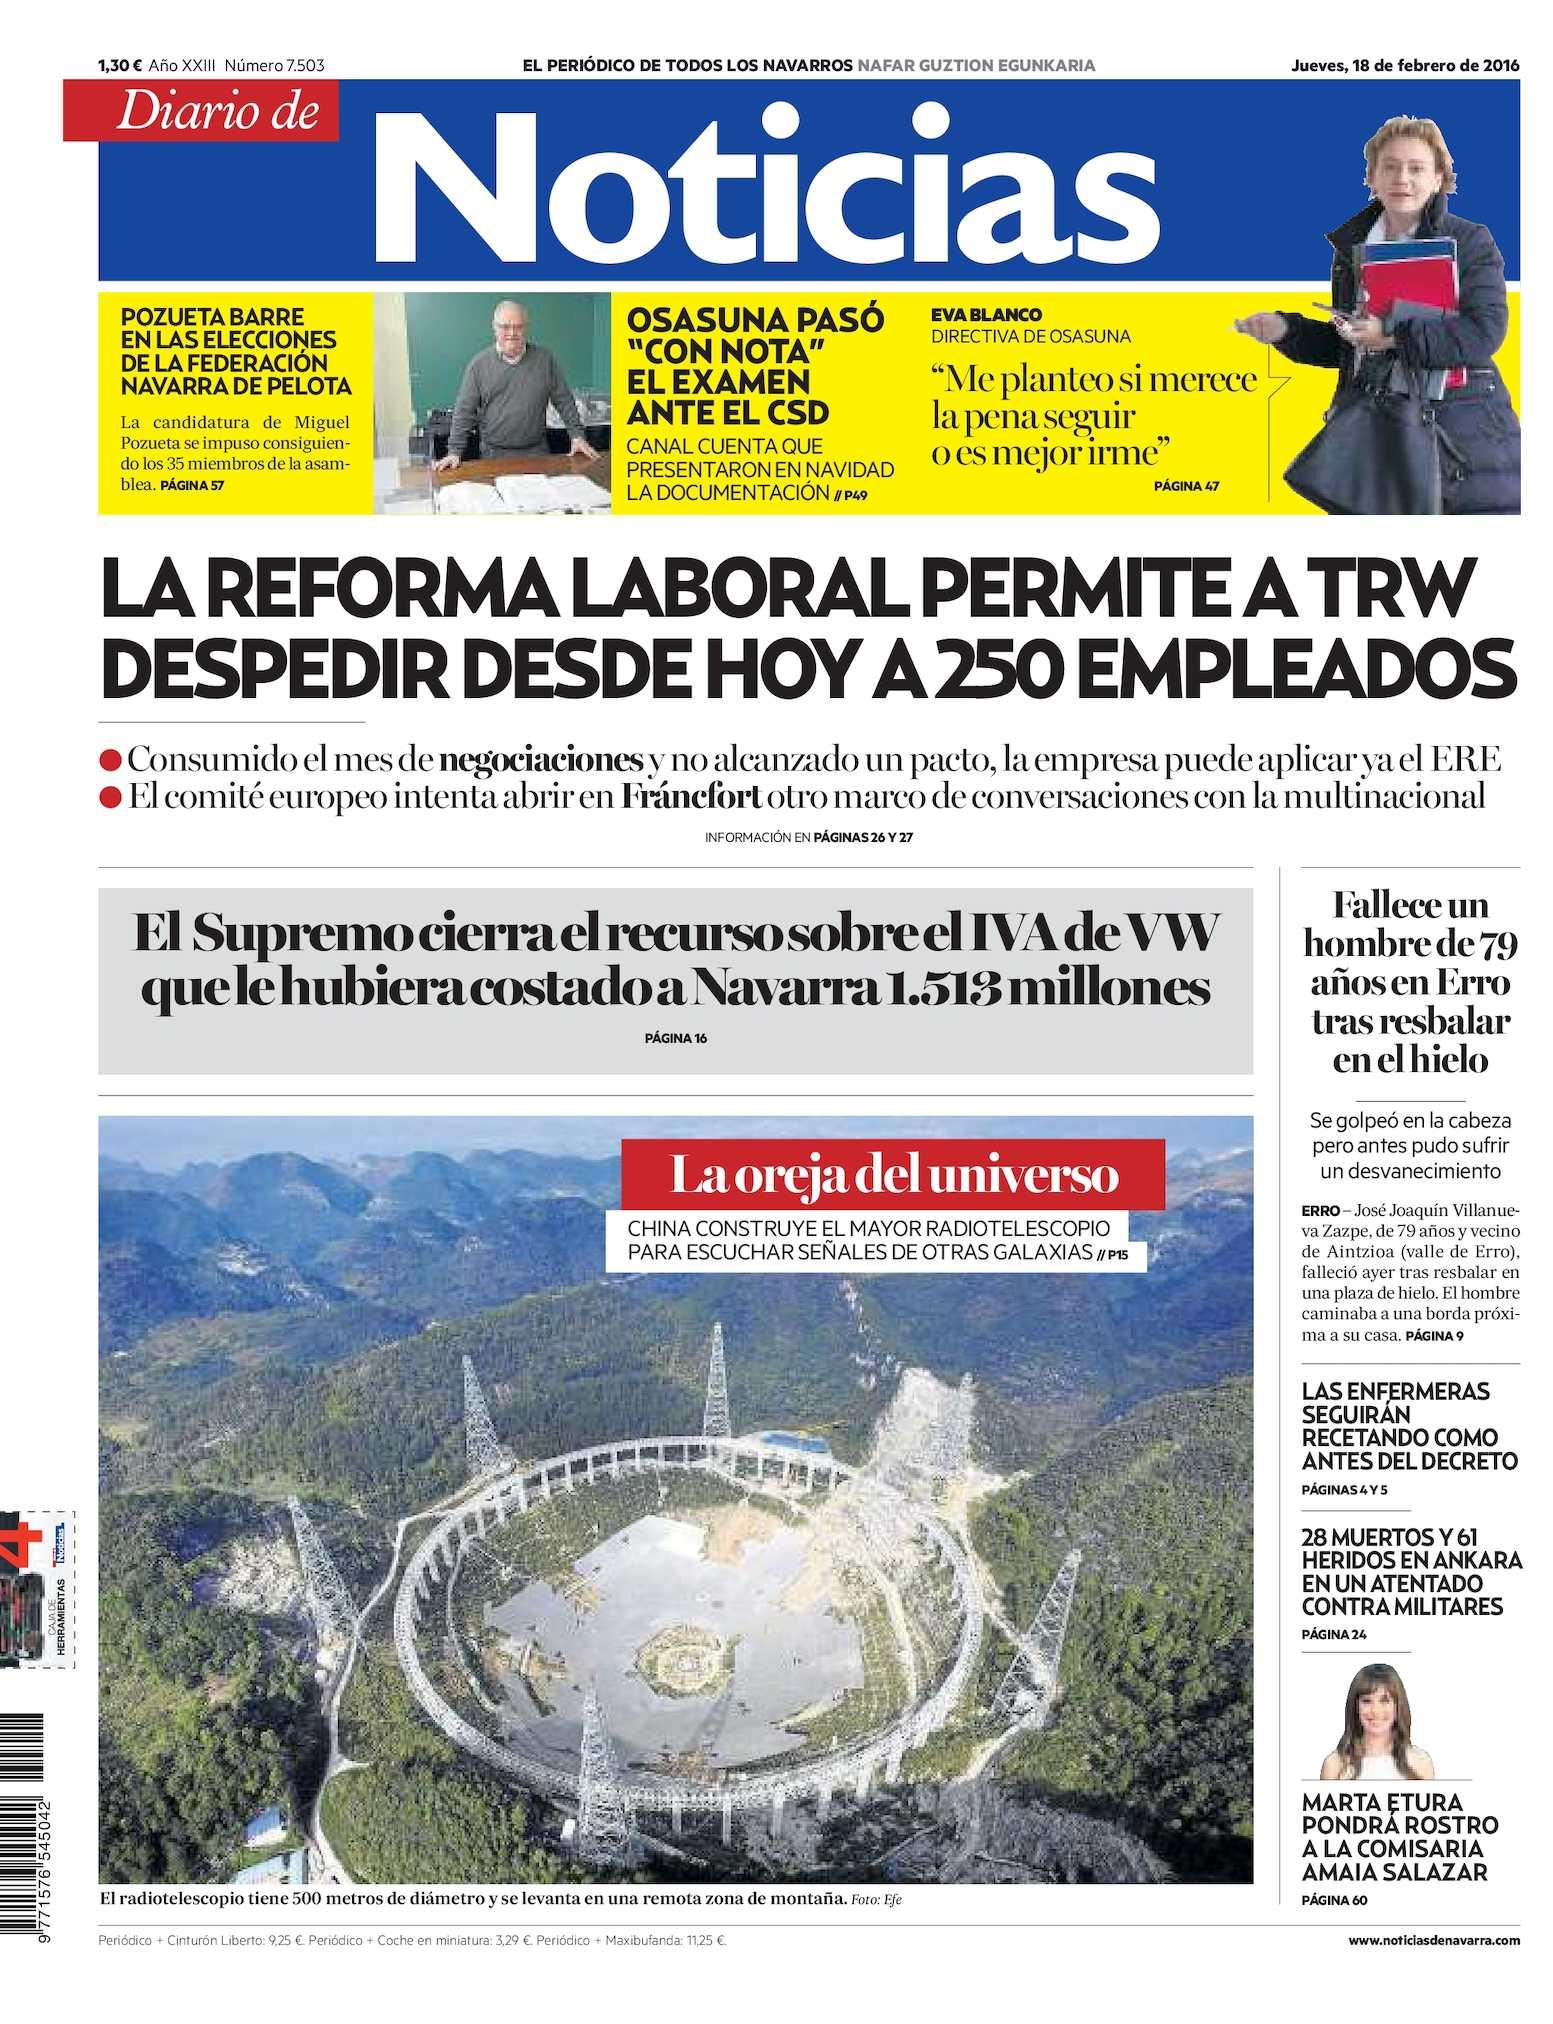 Calaméo - Diario de Noticias 20160218 f15cadc64b6af